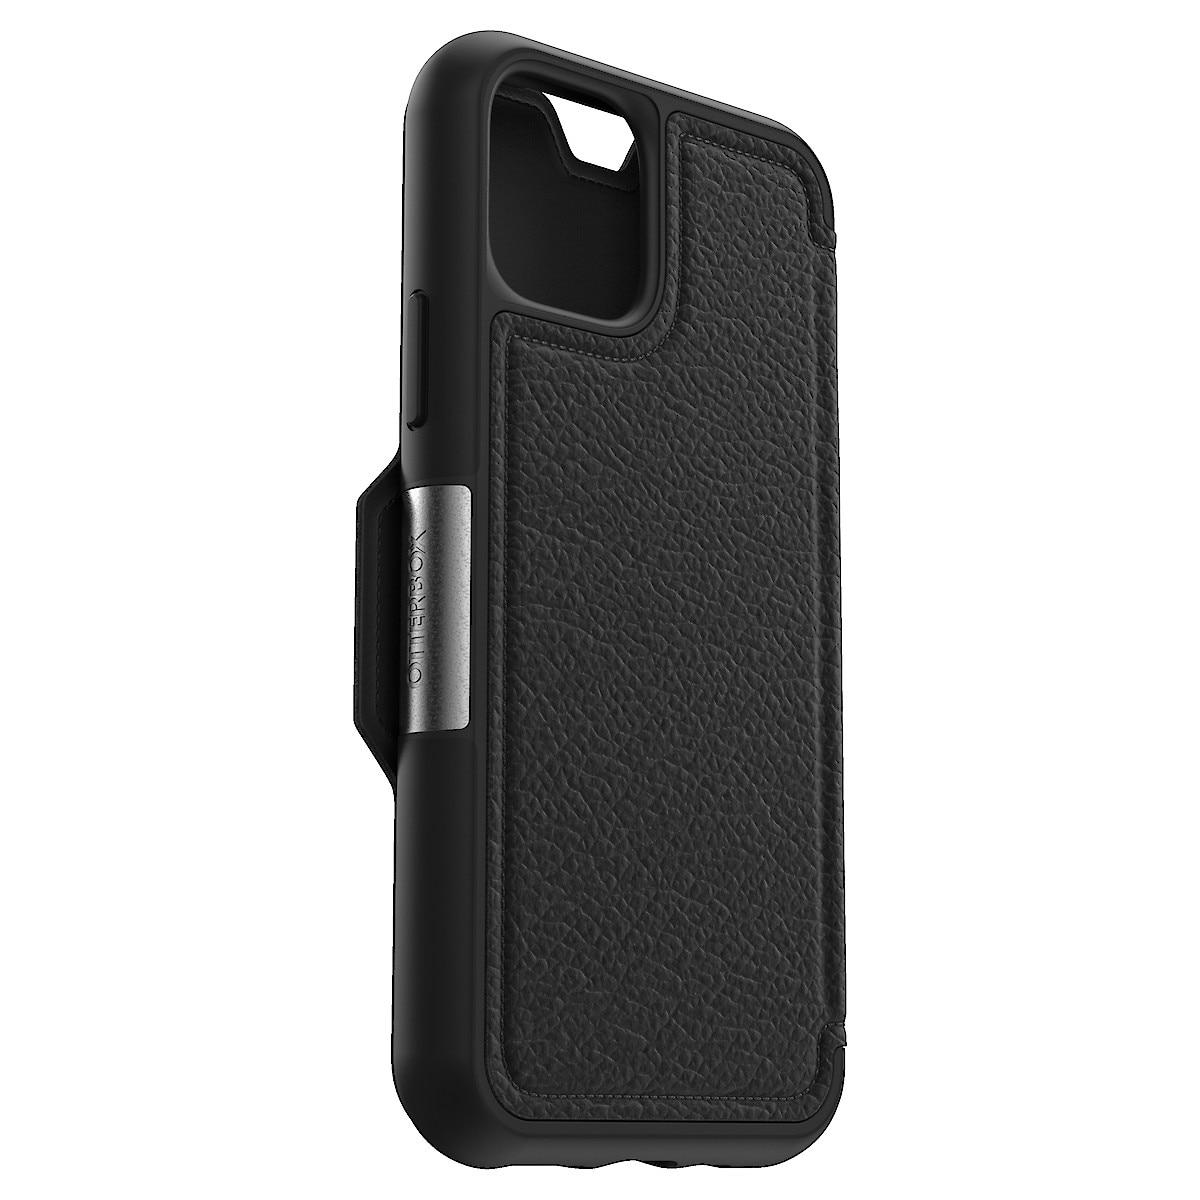 Otterbox Strada för iPhone 11 Pro Mobilfodral